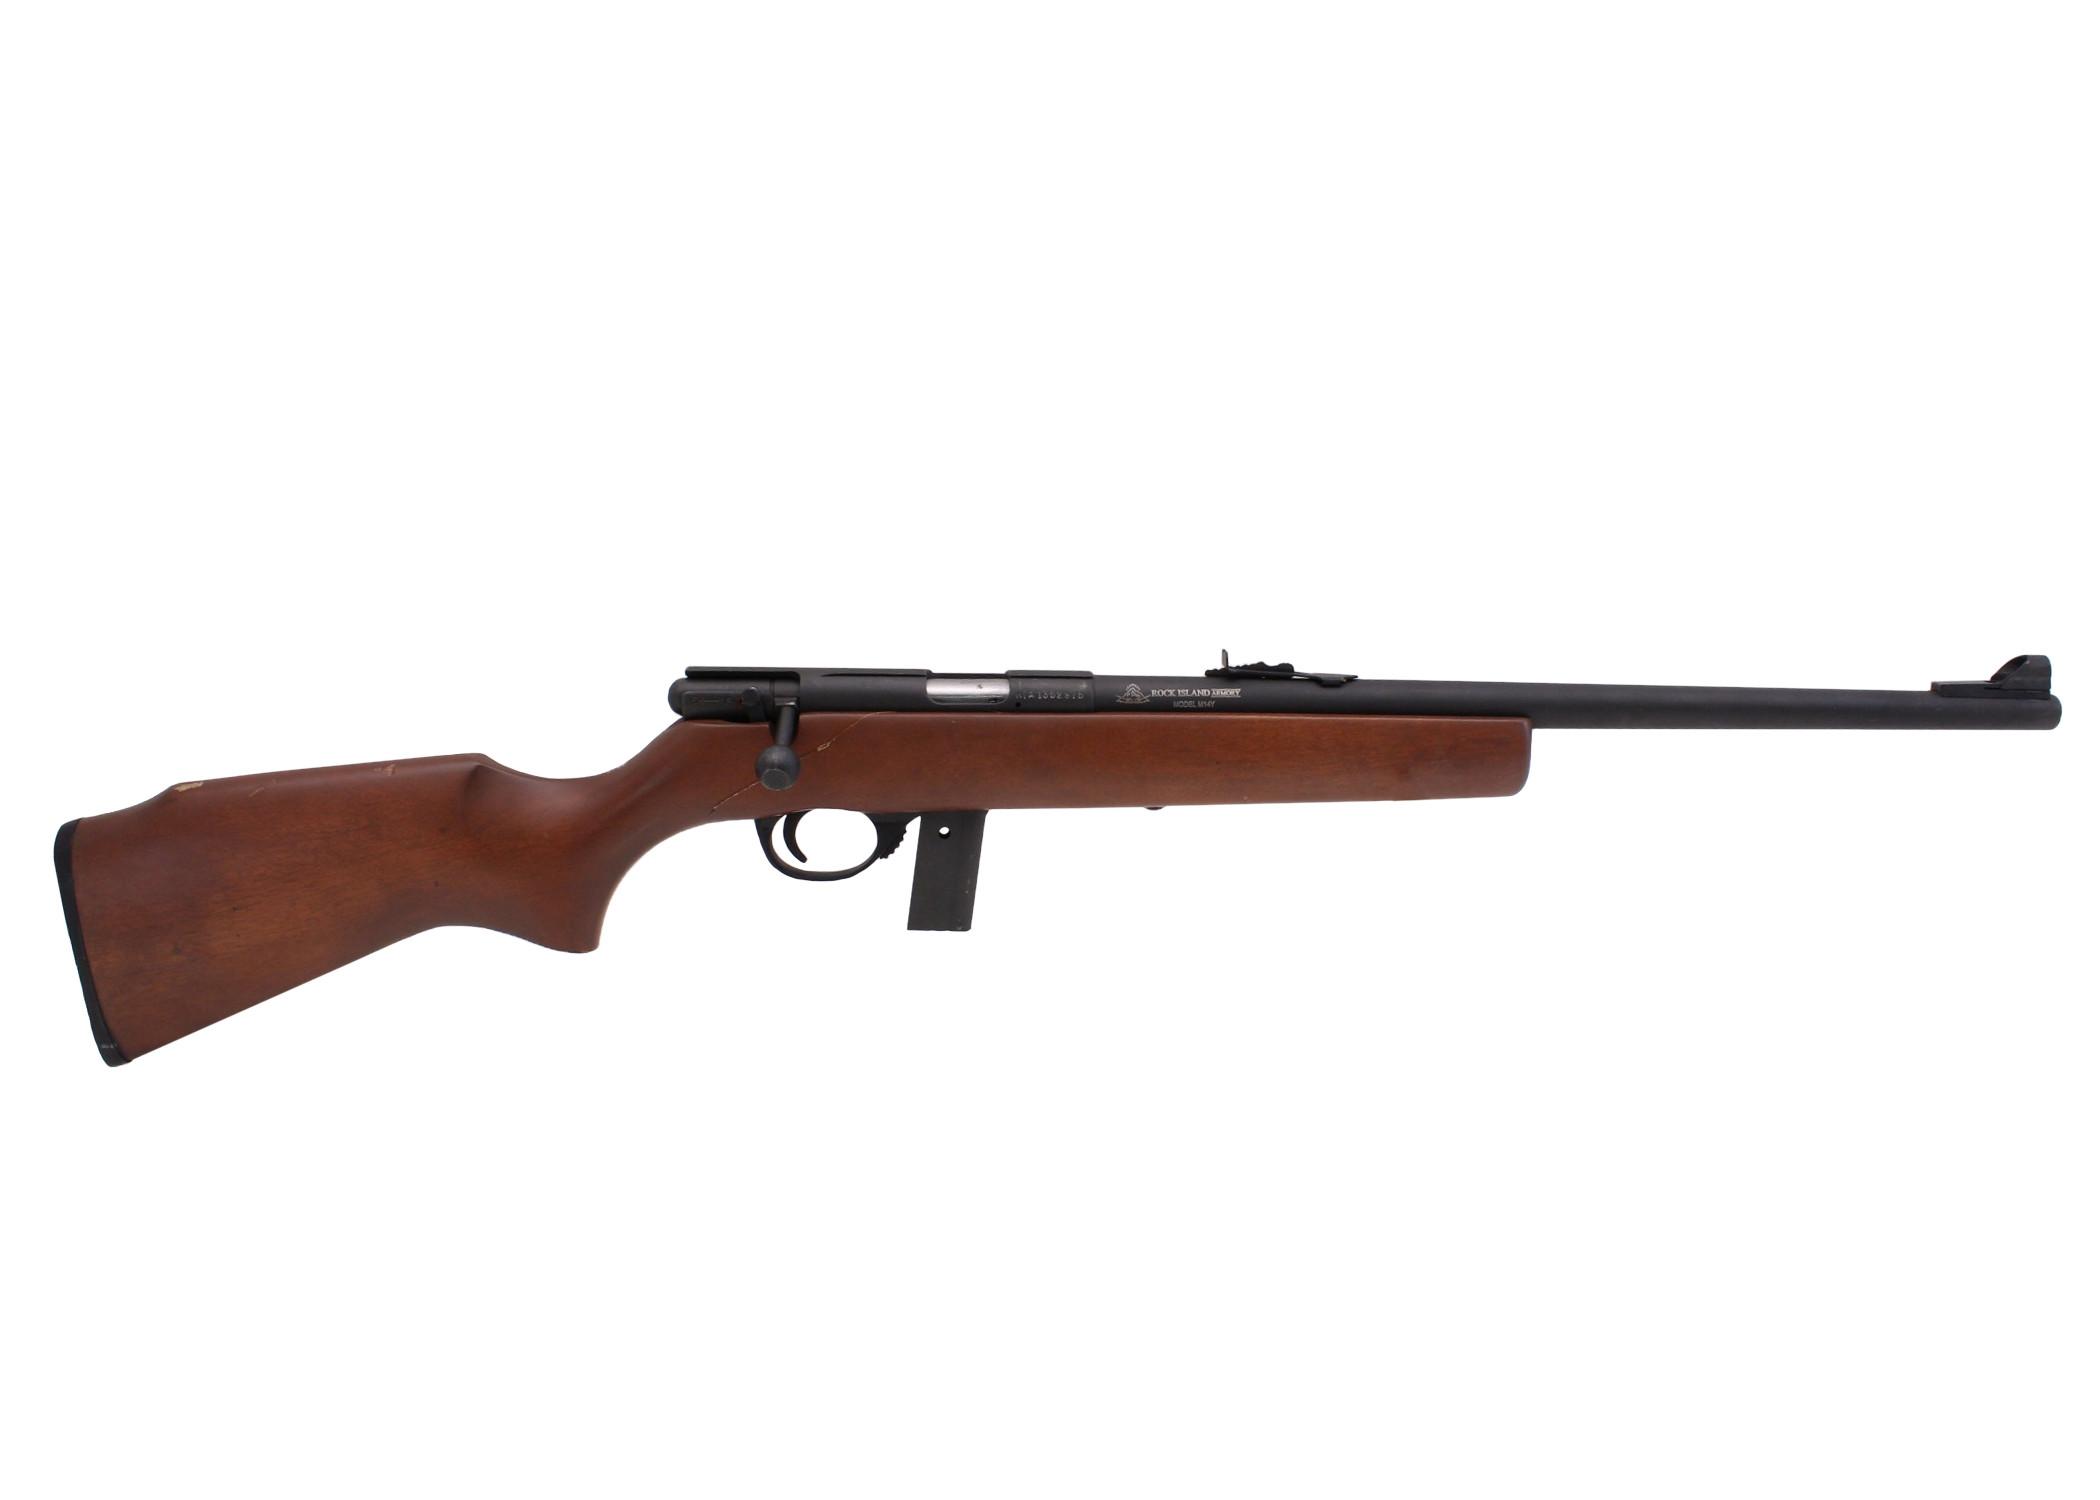 Armscor M14Y, .22LR, *Good, Cracked Stock*